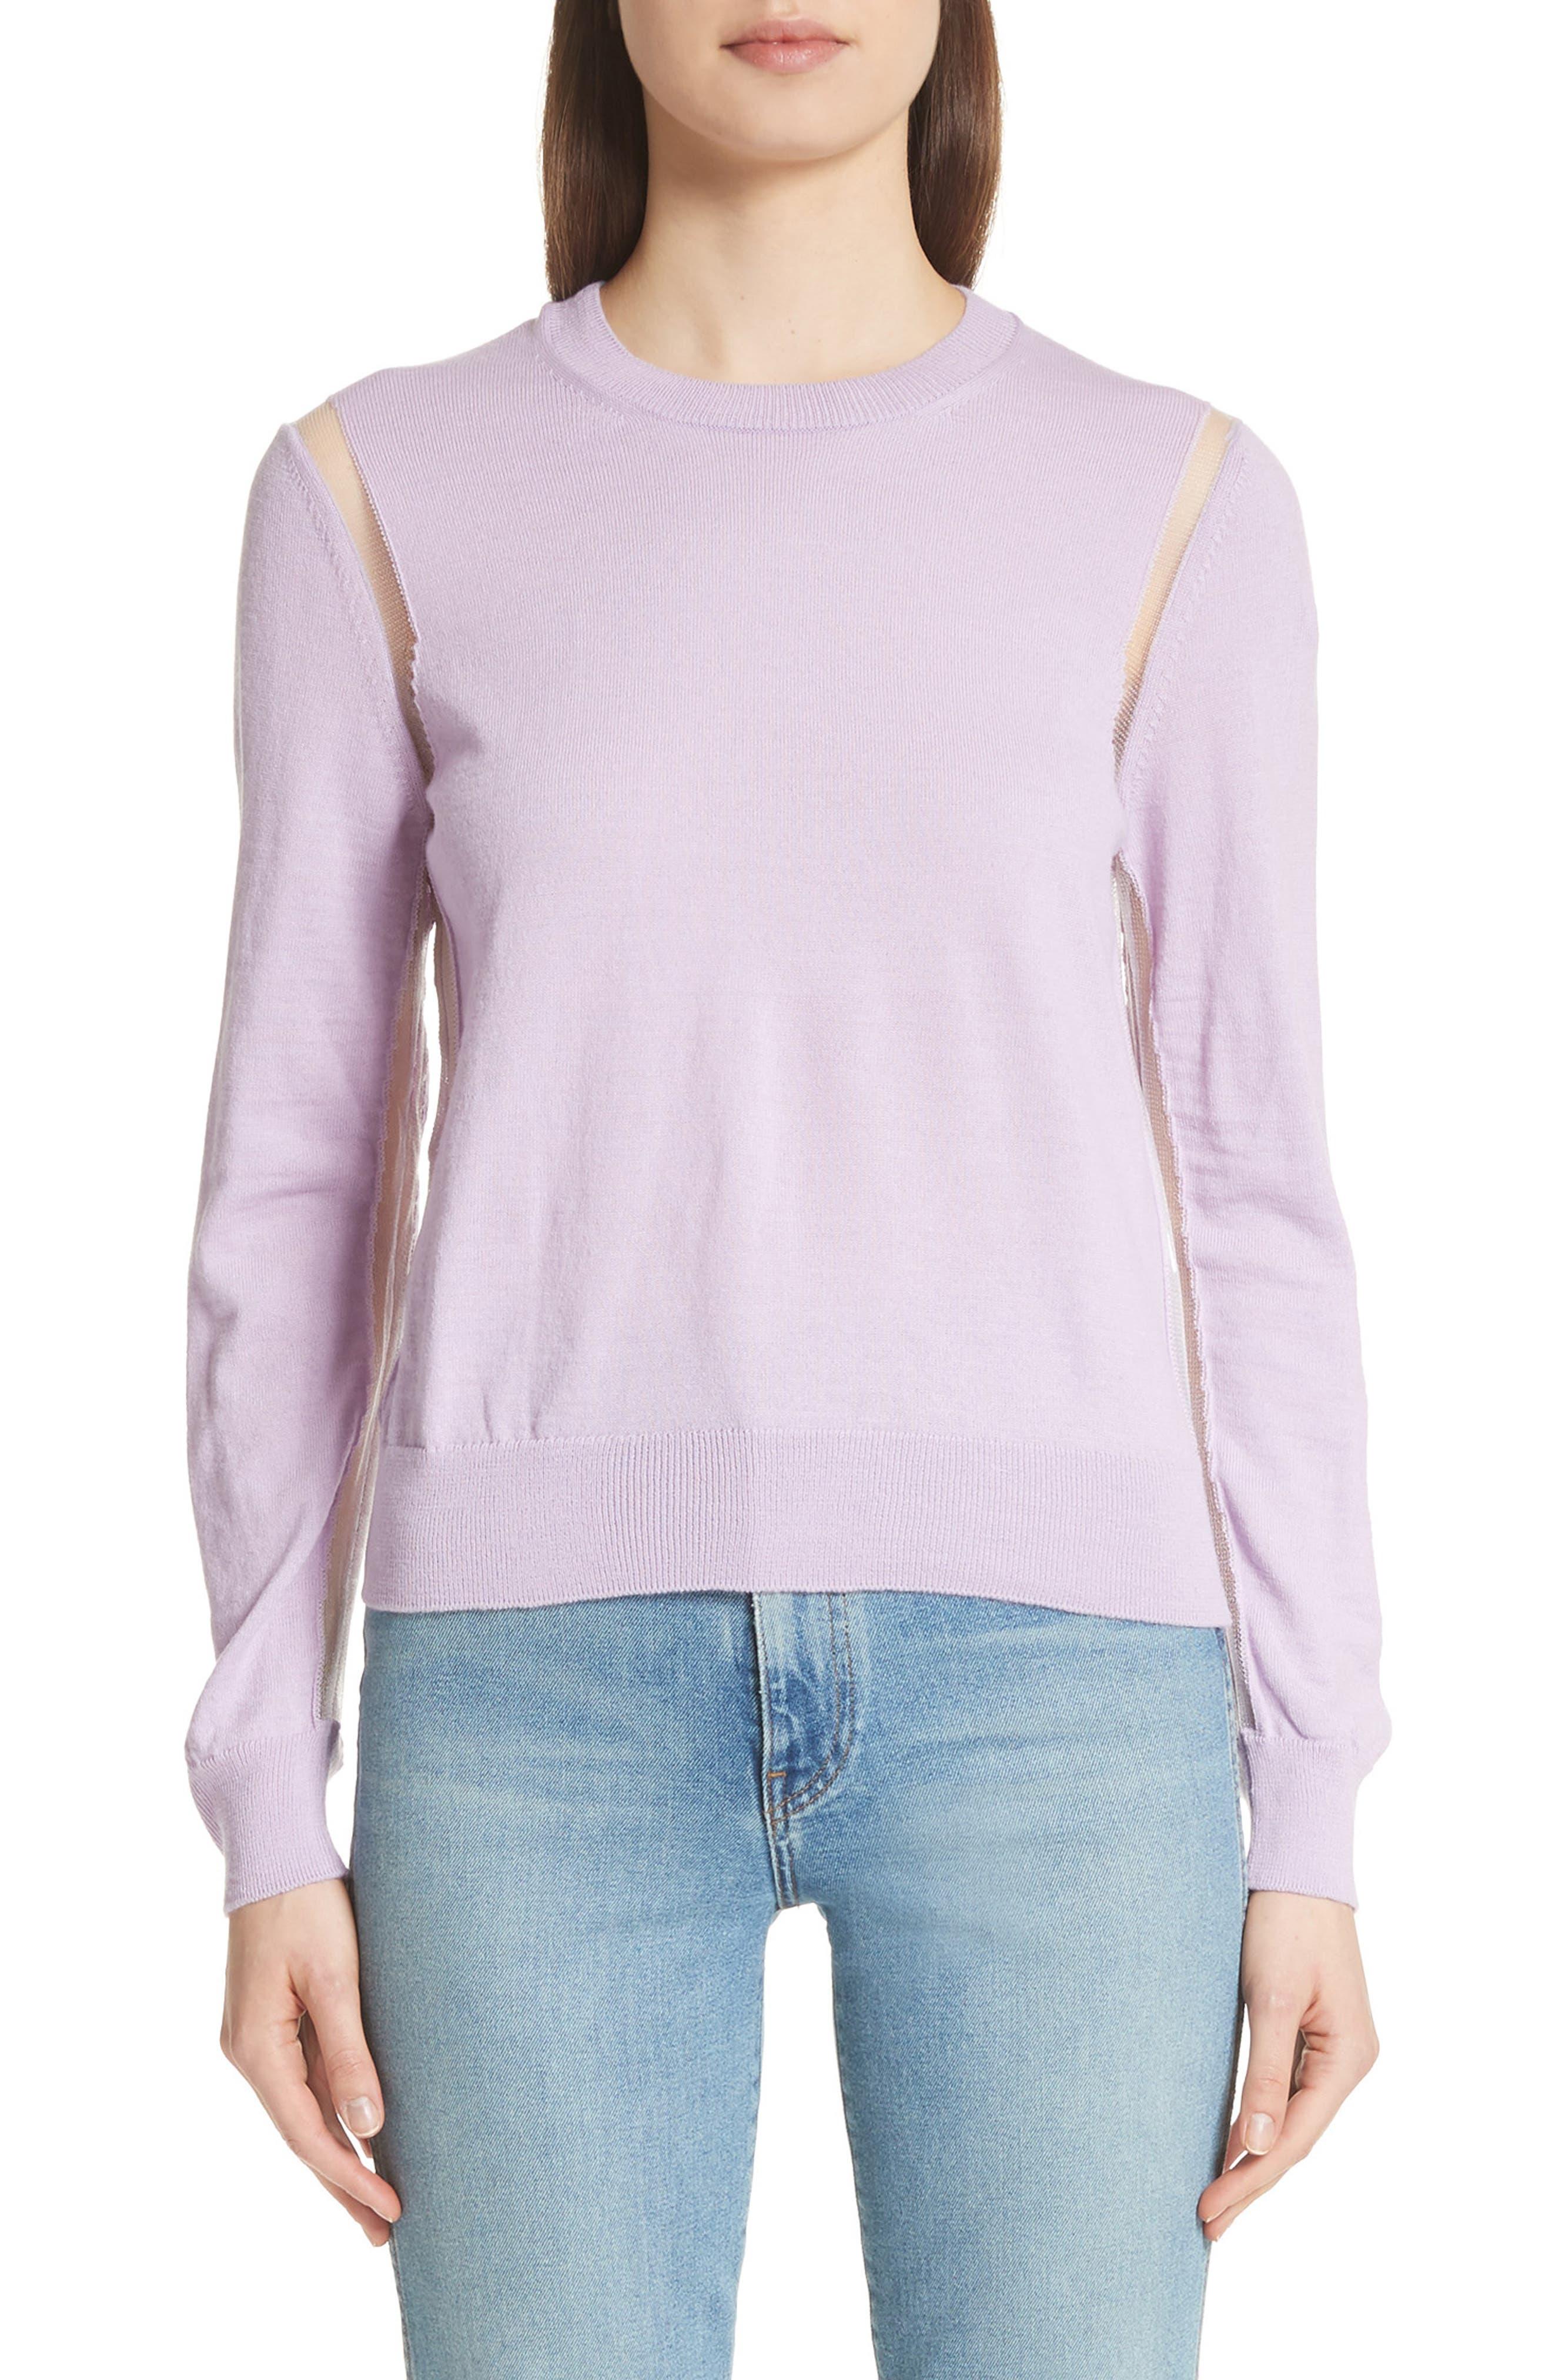 Comme des Garçons Sheer Panel Crewneck Sweater